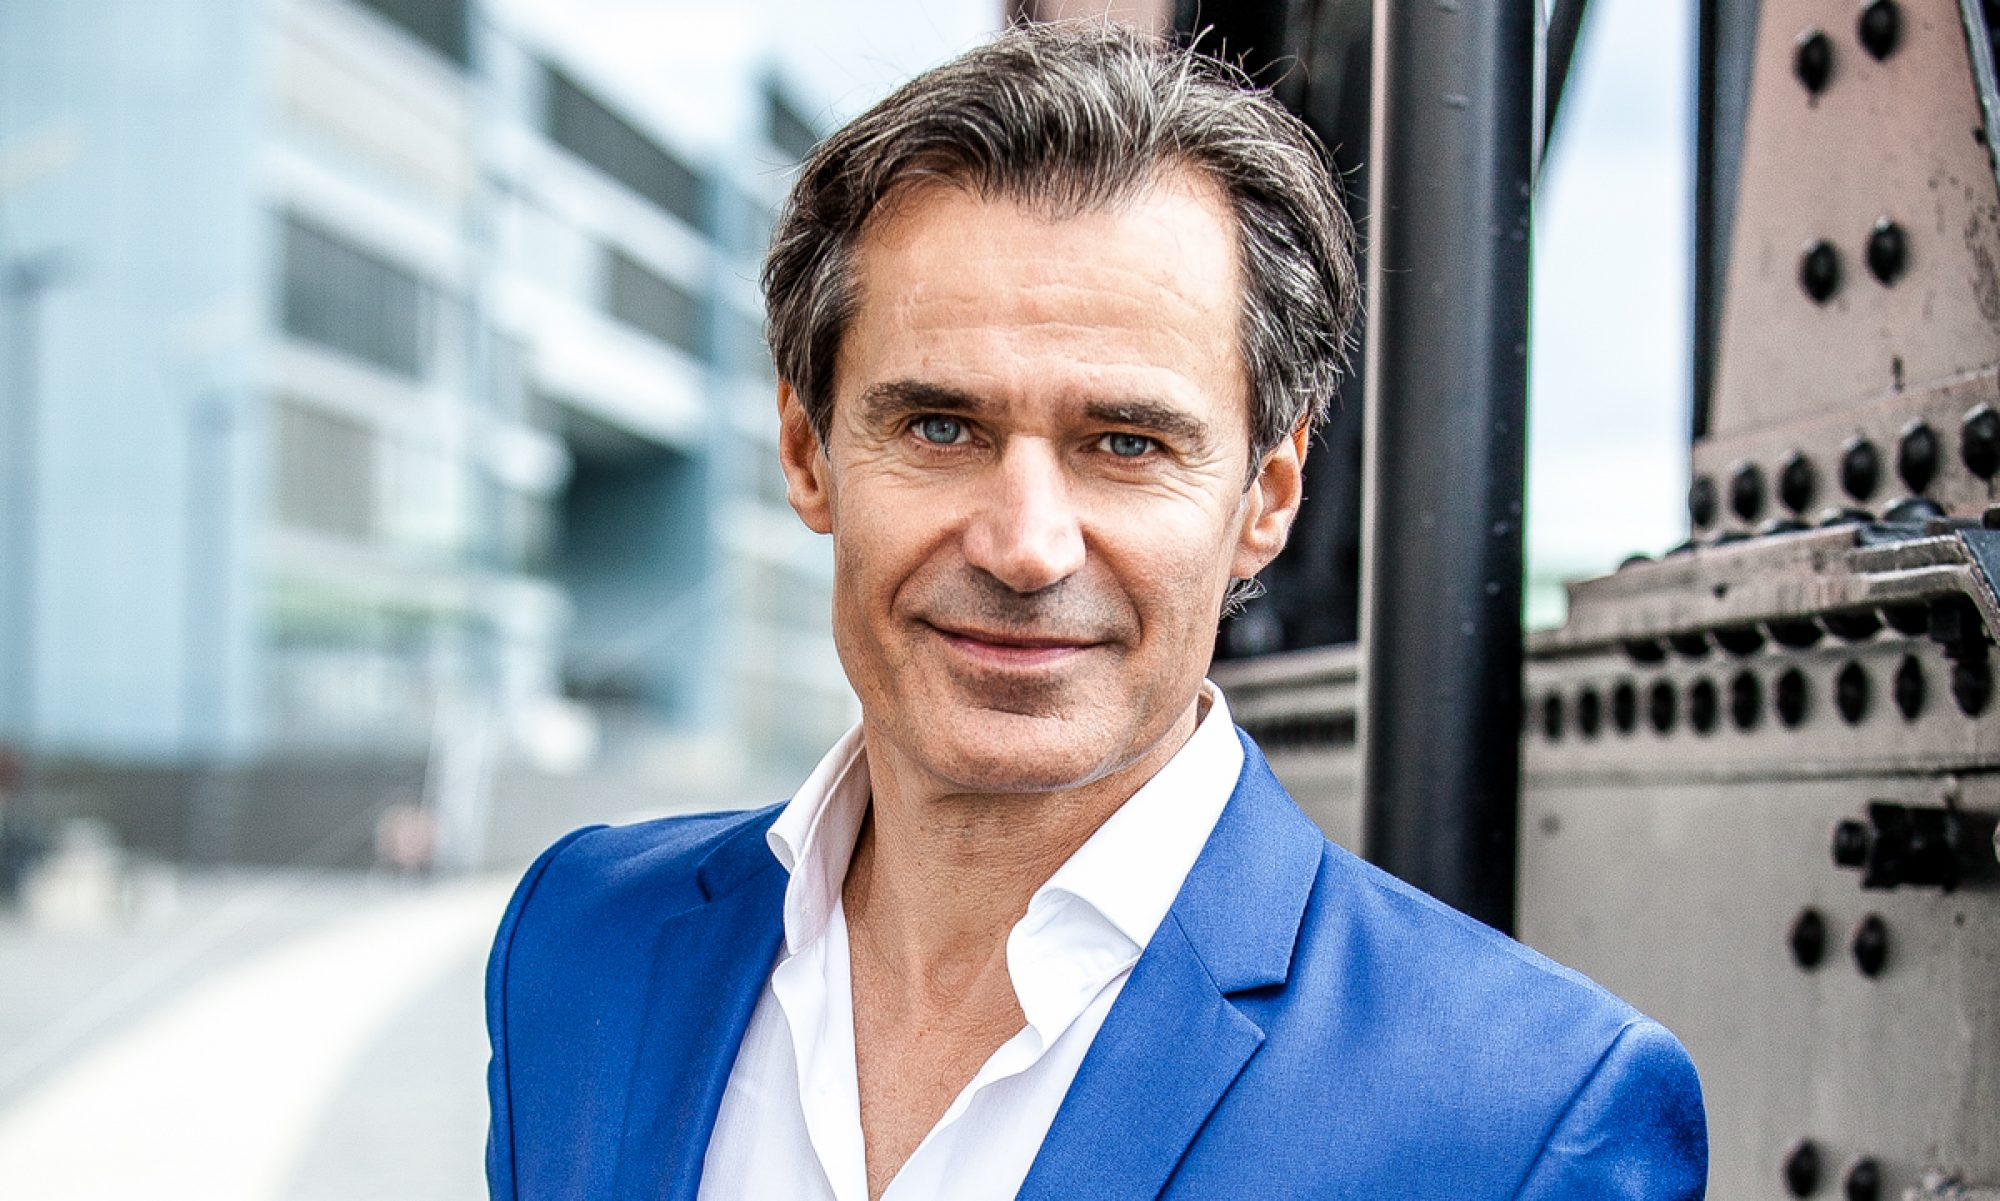 Klaus Nicola Holderbaum